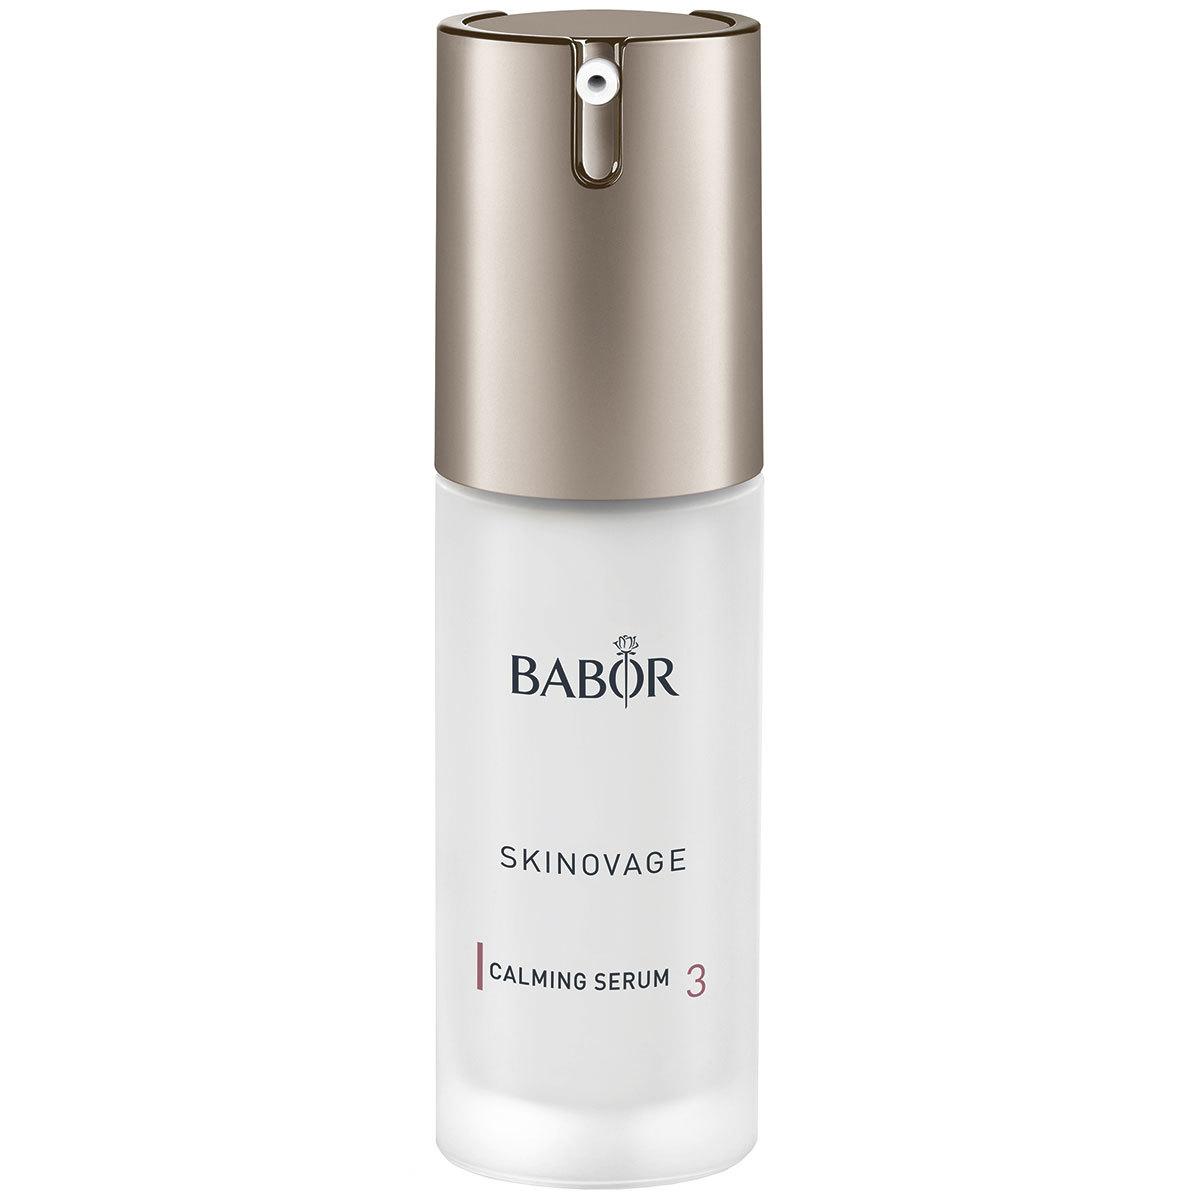 Сыворотка успокаивающая Babor Skinovage Calming Serum 30ml